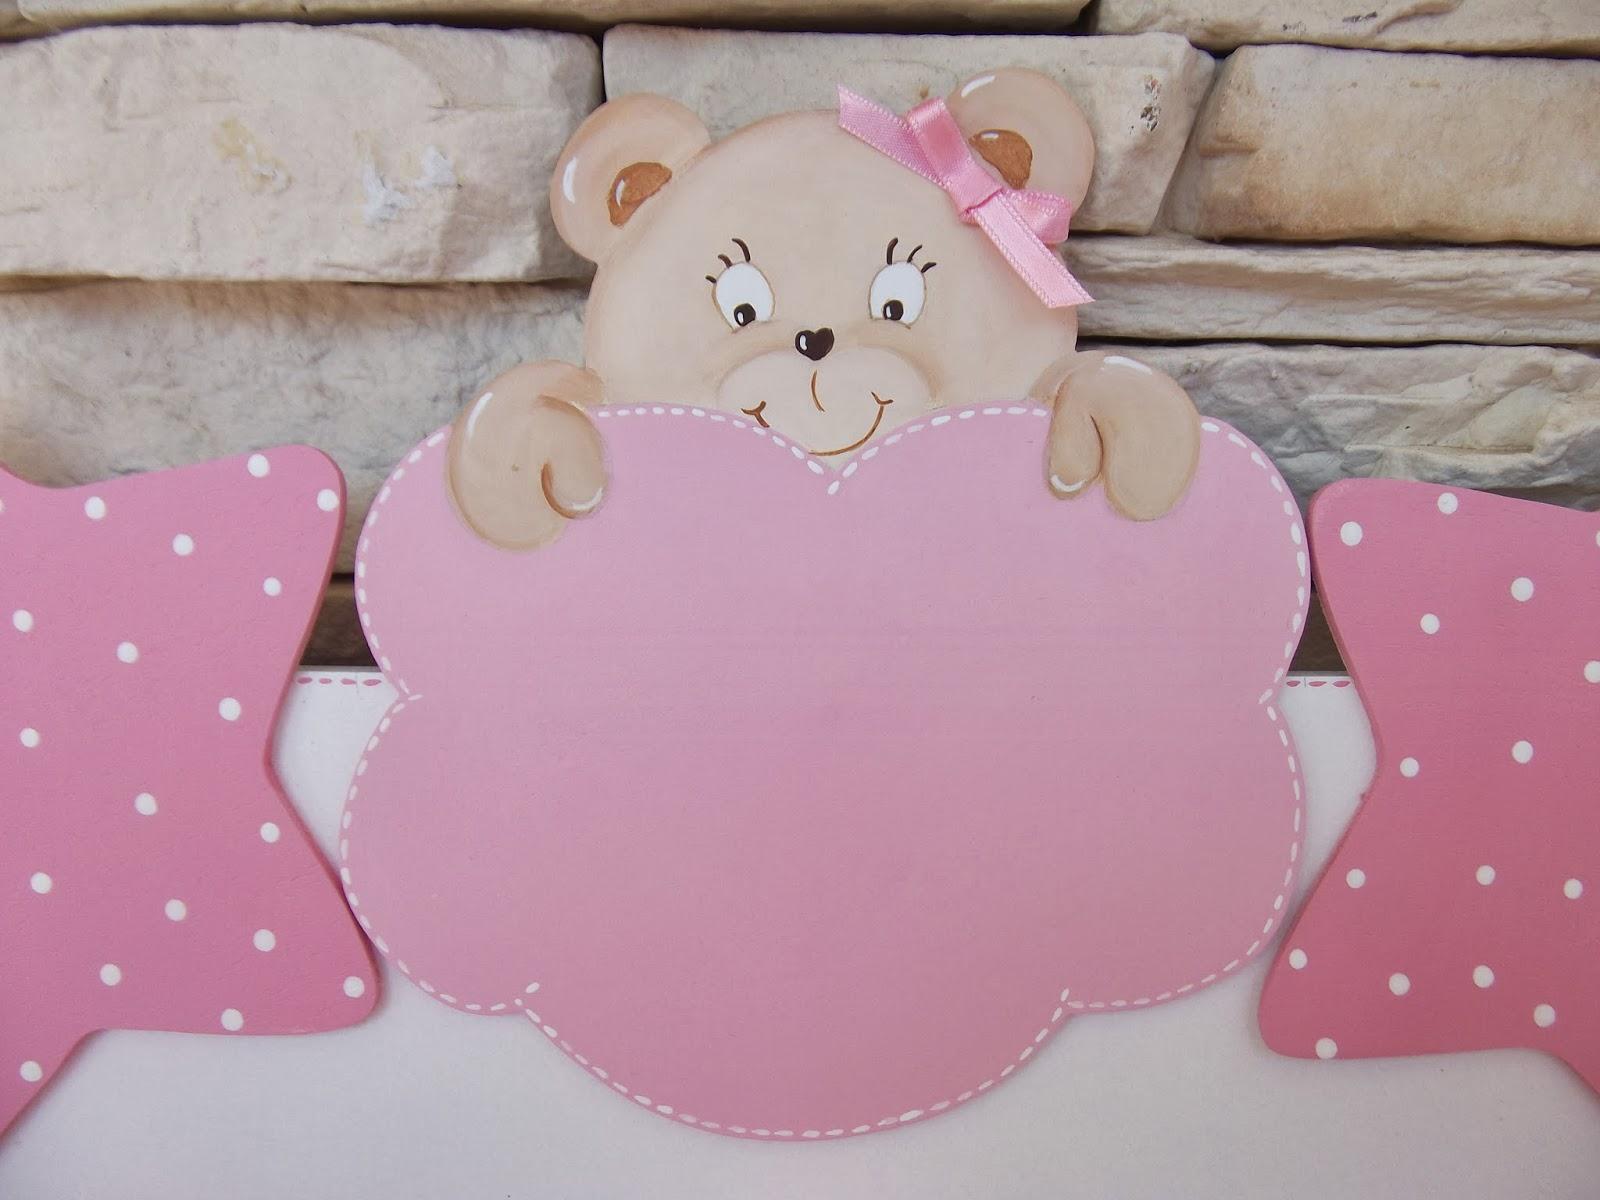 Decoraci n infantil pekerines percha para beb s - Perchas para bebes ...